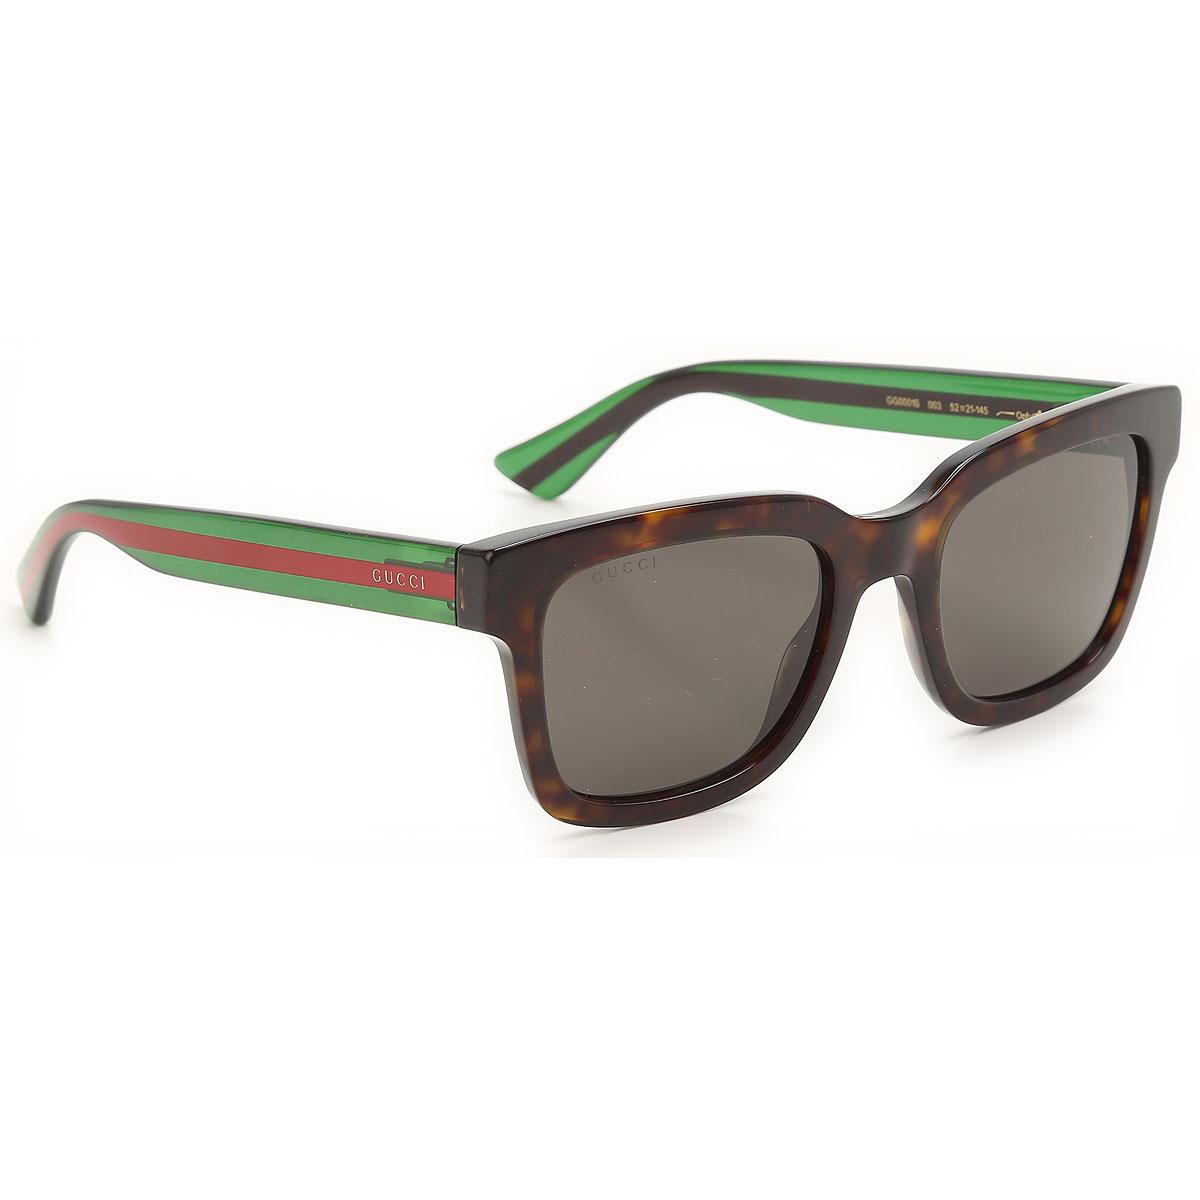 Gafas y Lentes de Sol Gucci, Detalle Modelo: gg0001s-003-